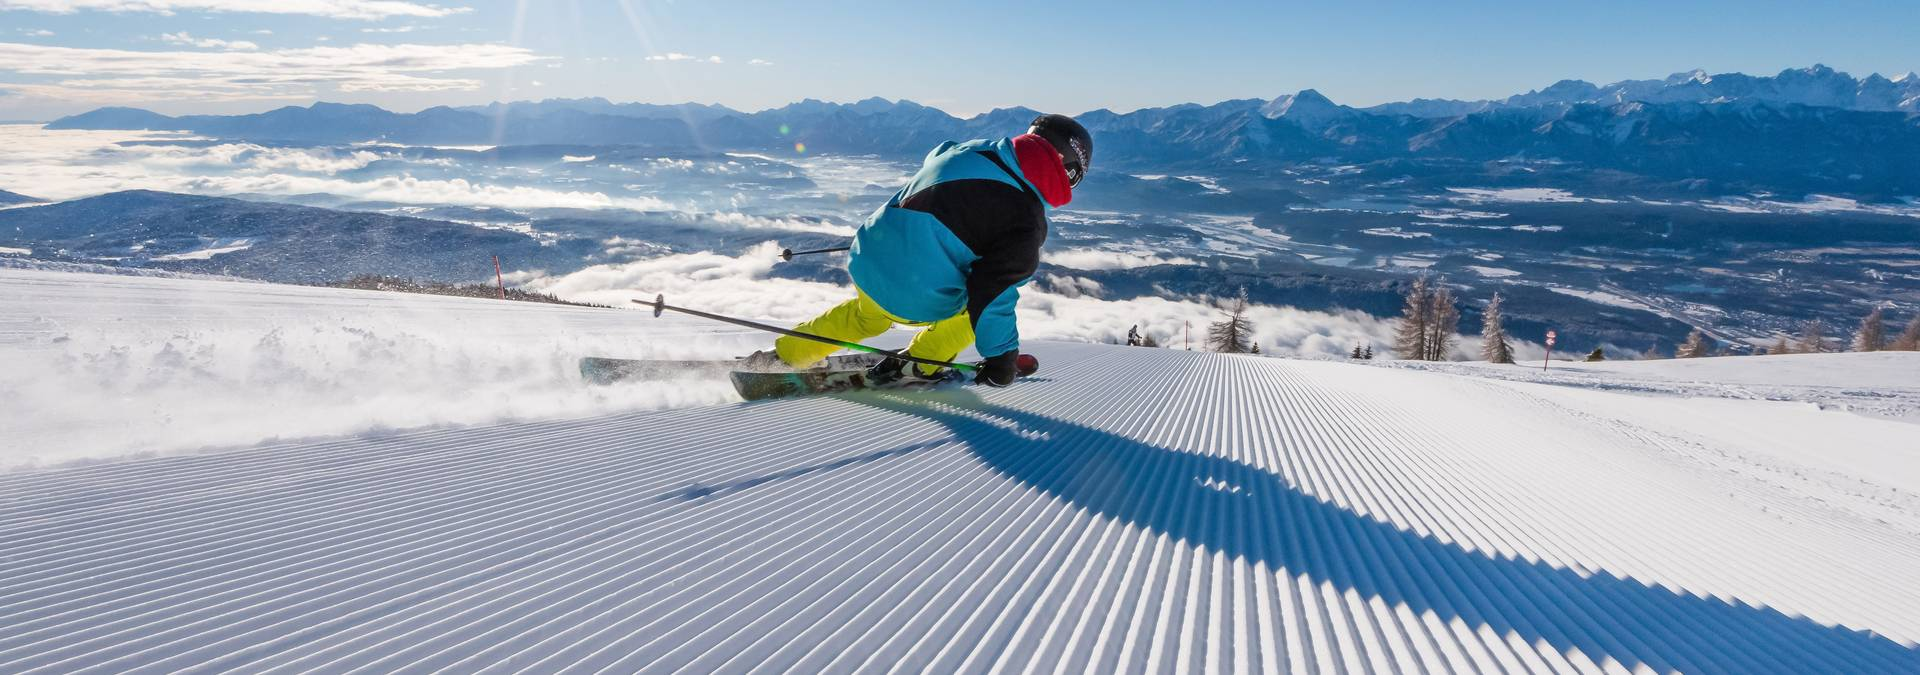 Region Villach_Ski Alpin